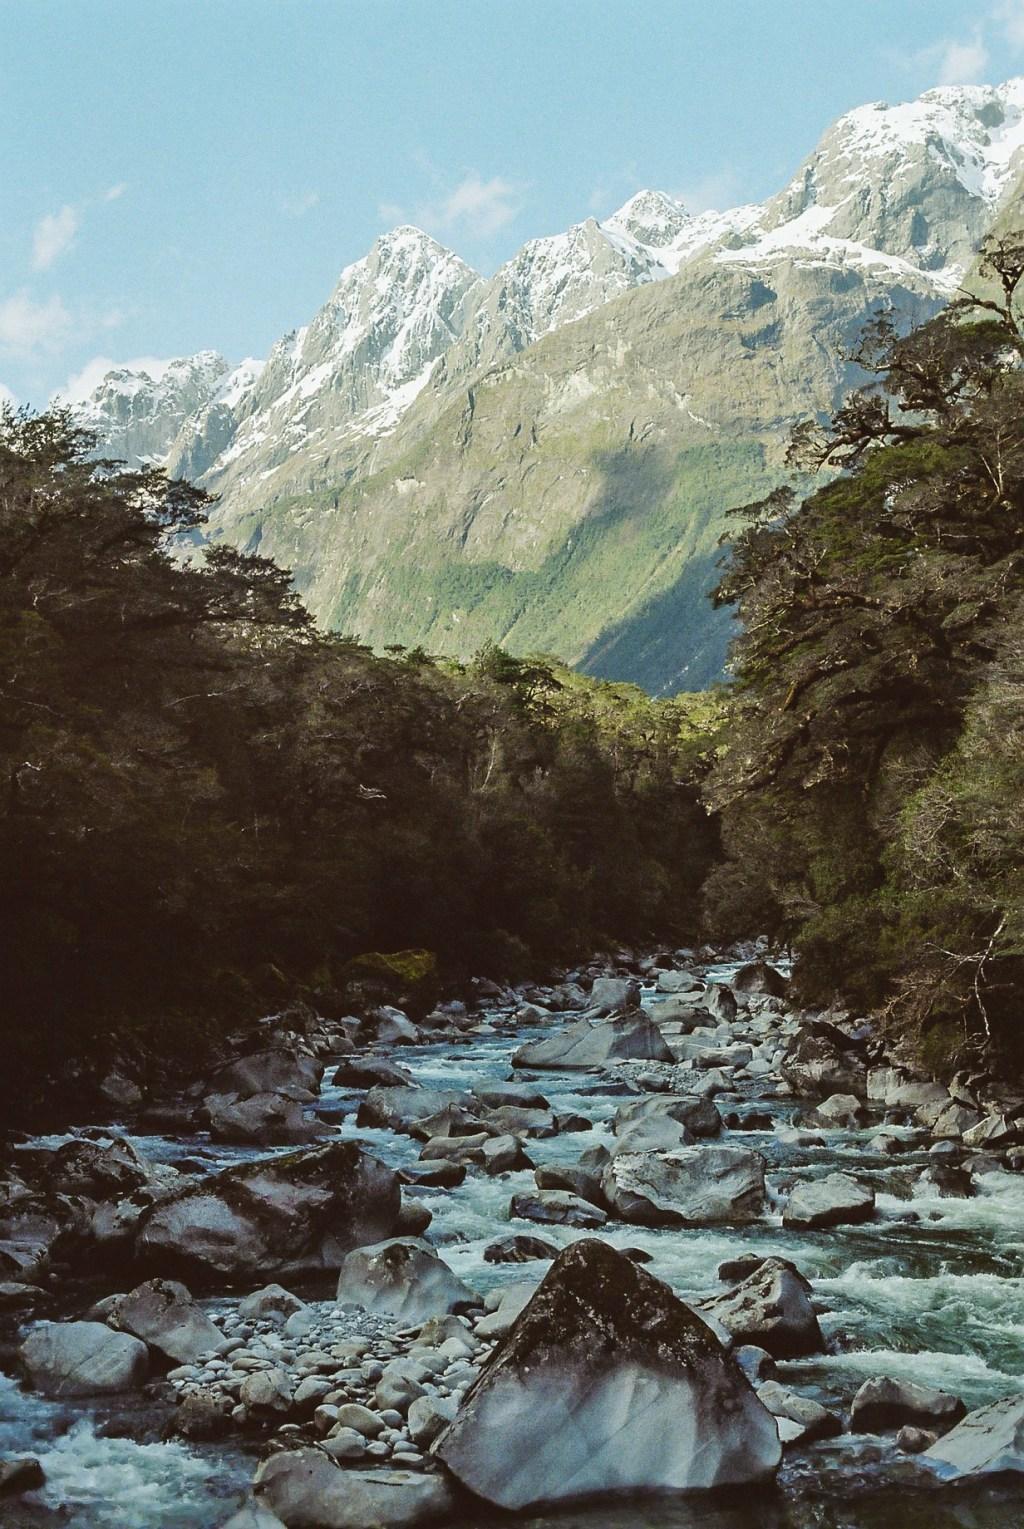 Strange Triangular Rock in Fiordland National Park, New Zealand South Island